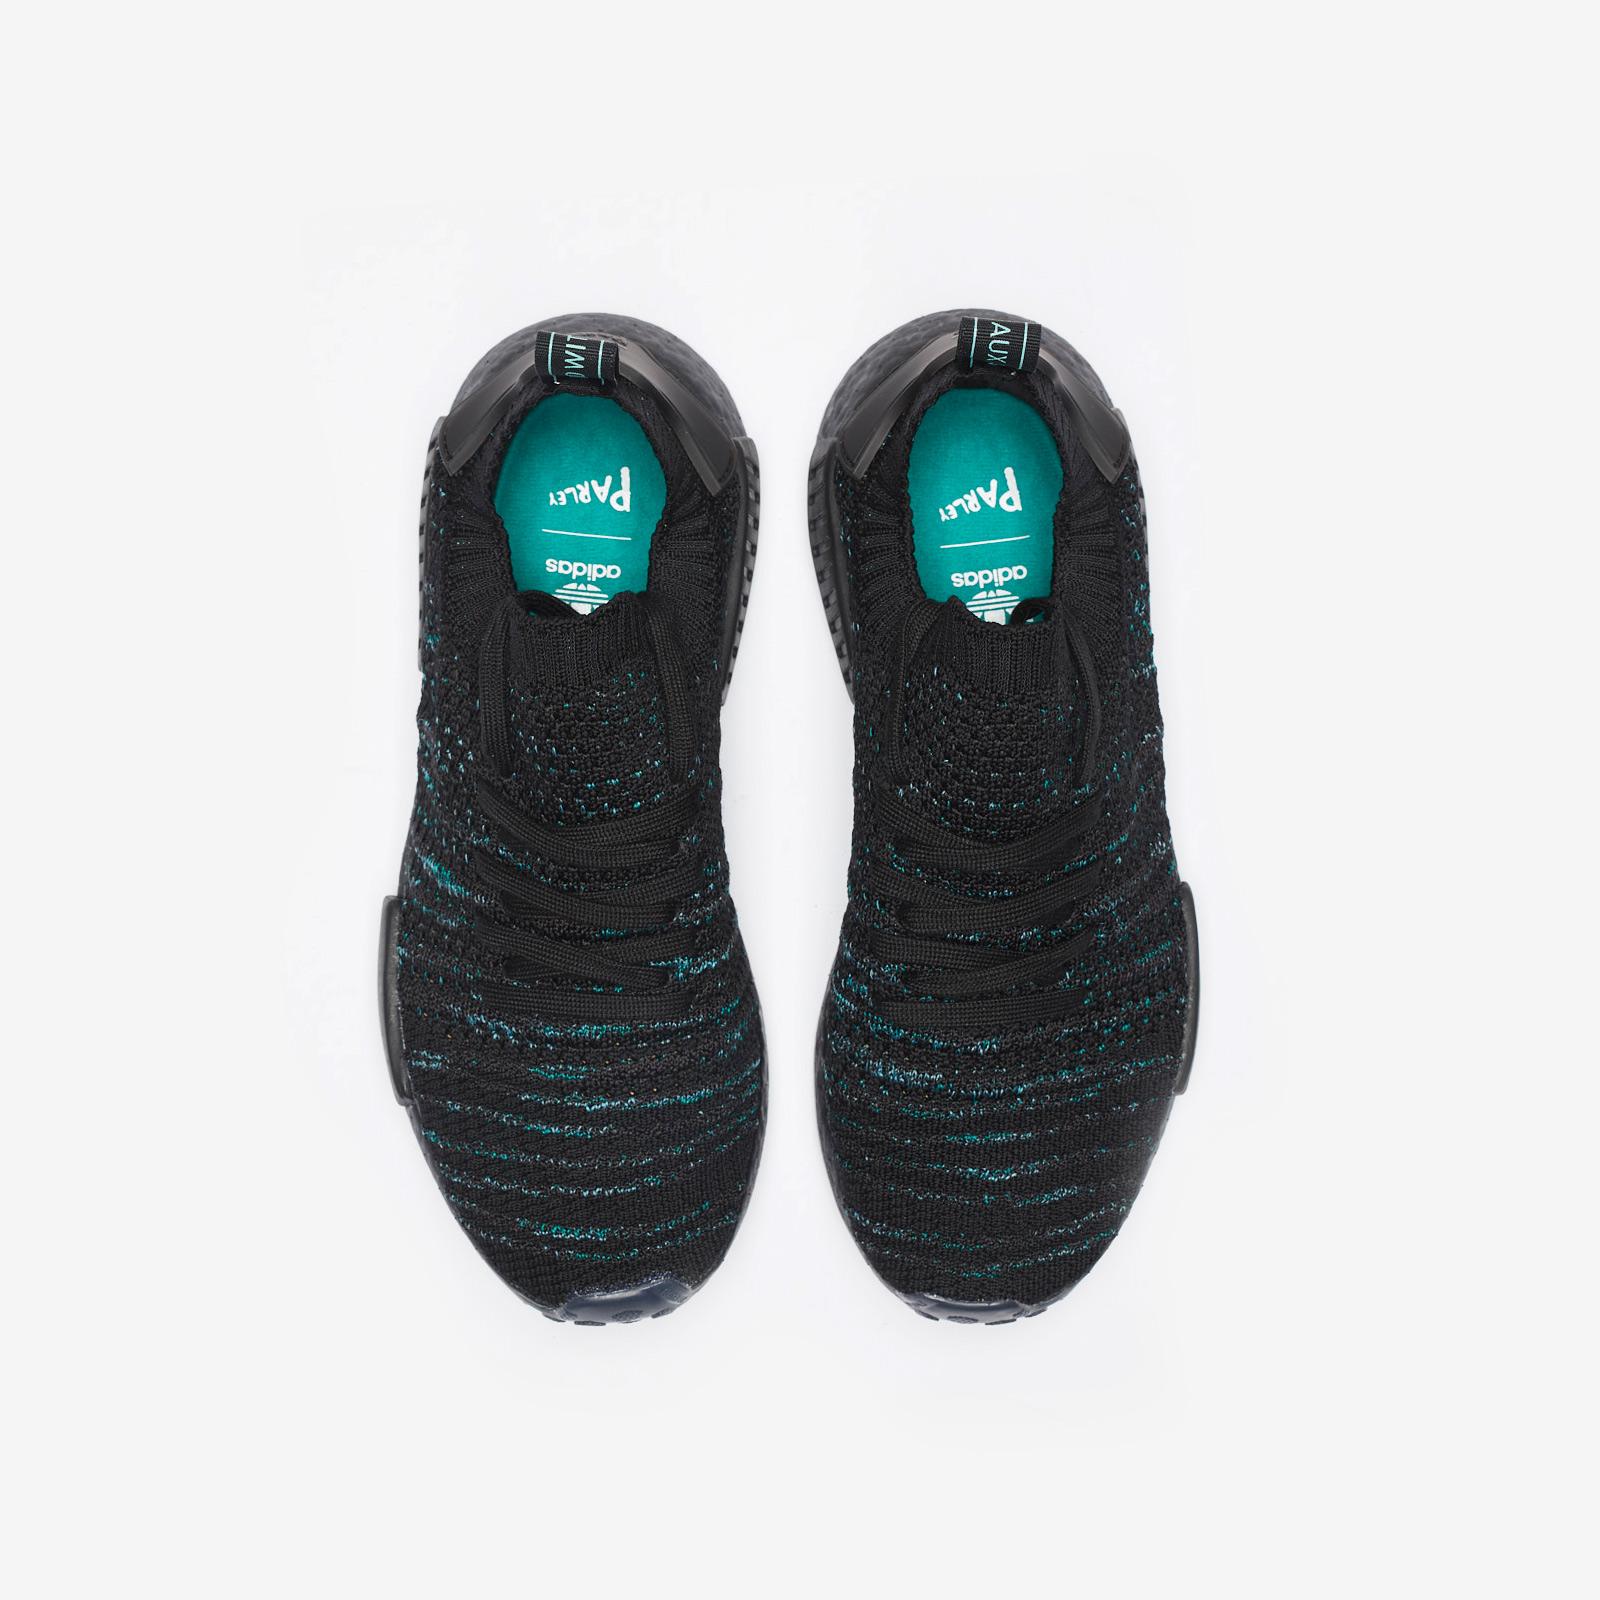 14269a0e3 adidas NMD R1 STLT Parley PK - Aq0943 - Sneakersnstuff